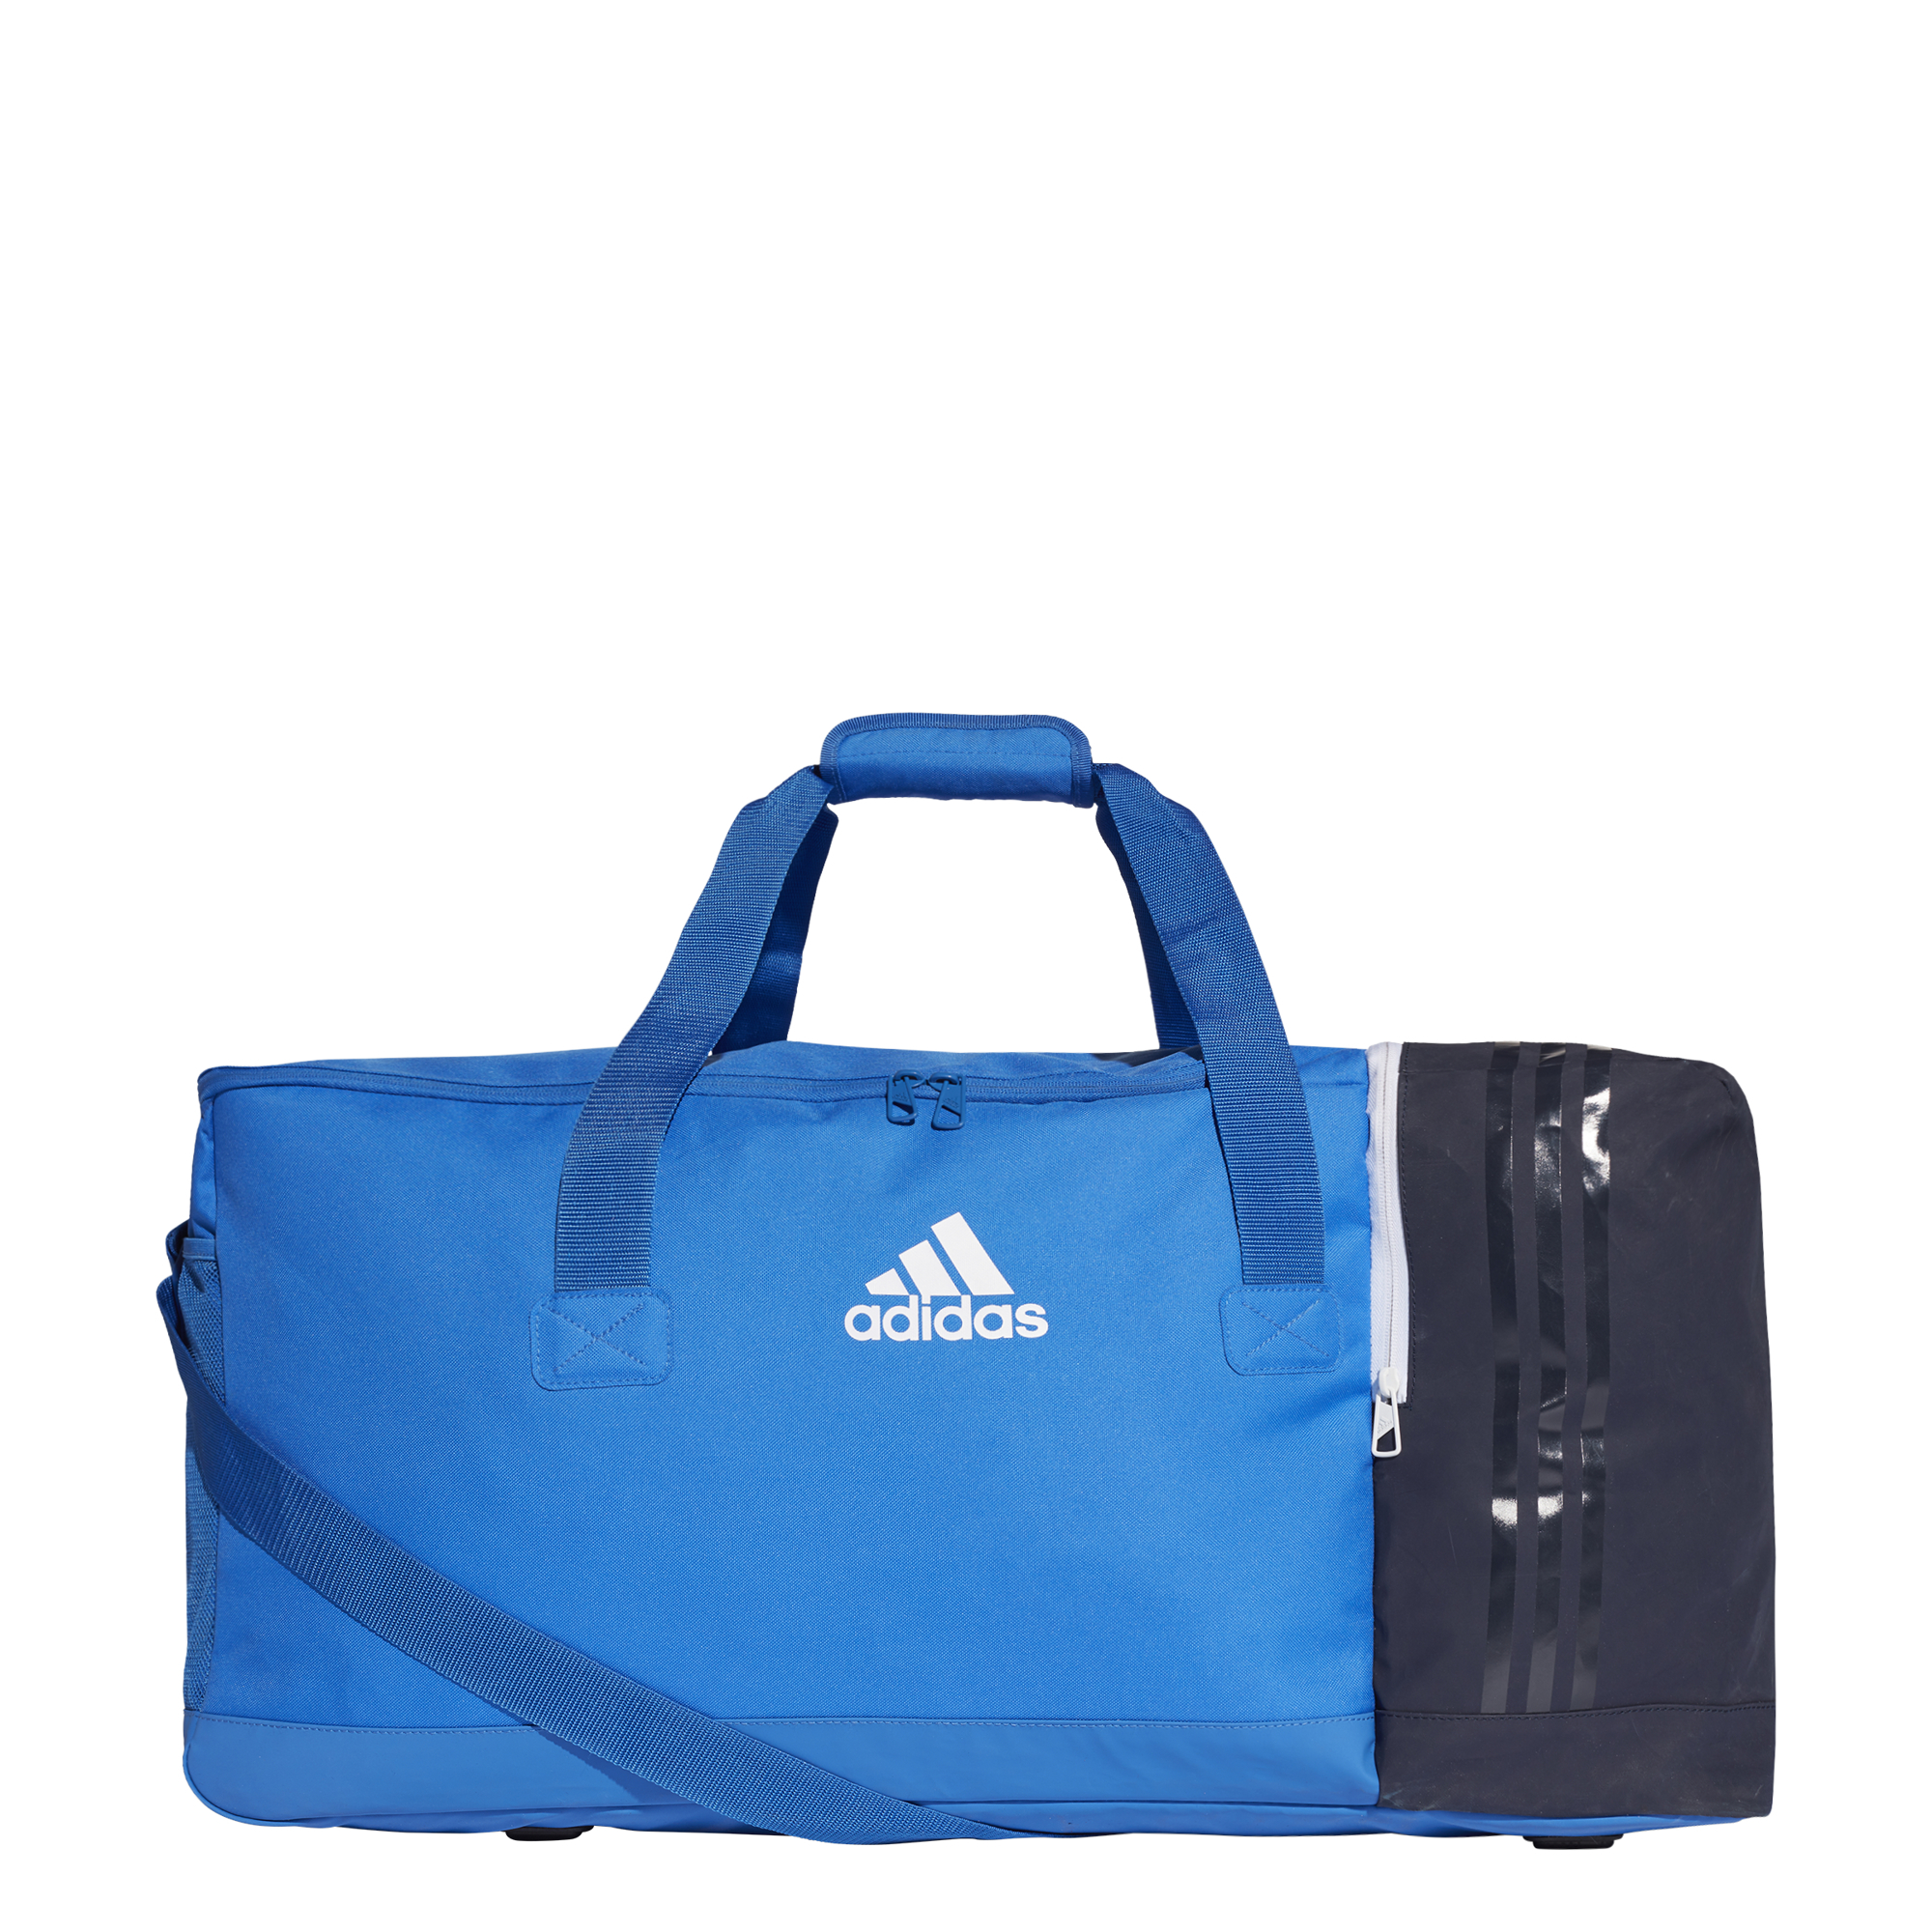 62180087d979e adidas Tiro Teambag - Large - Sporttasche mit Schuhfach - BS4743 blau 001